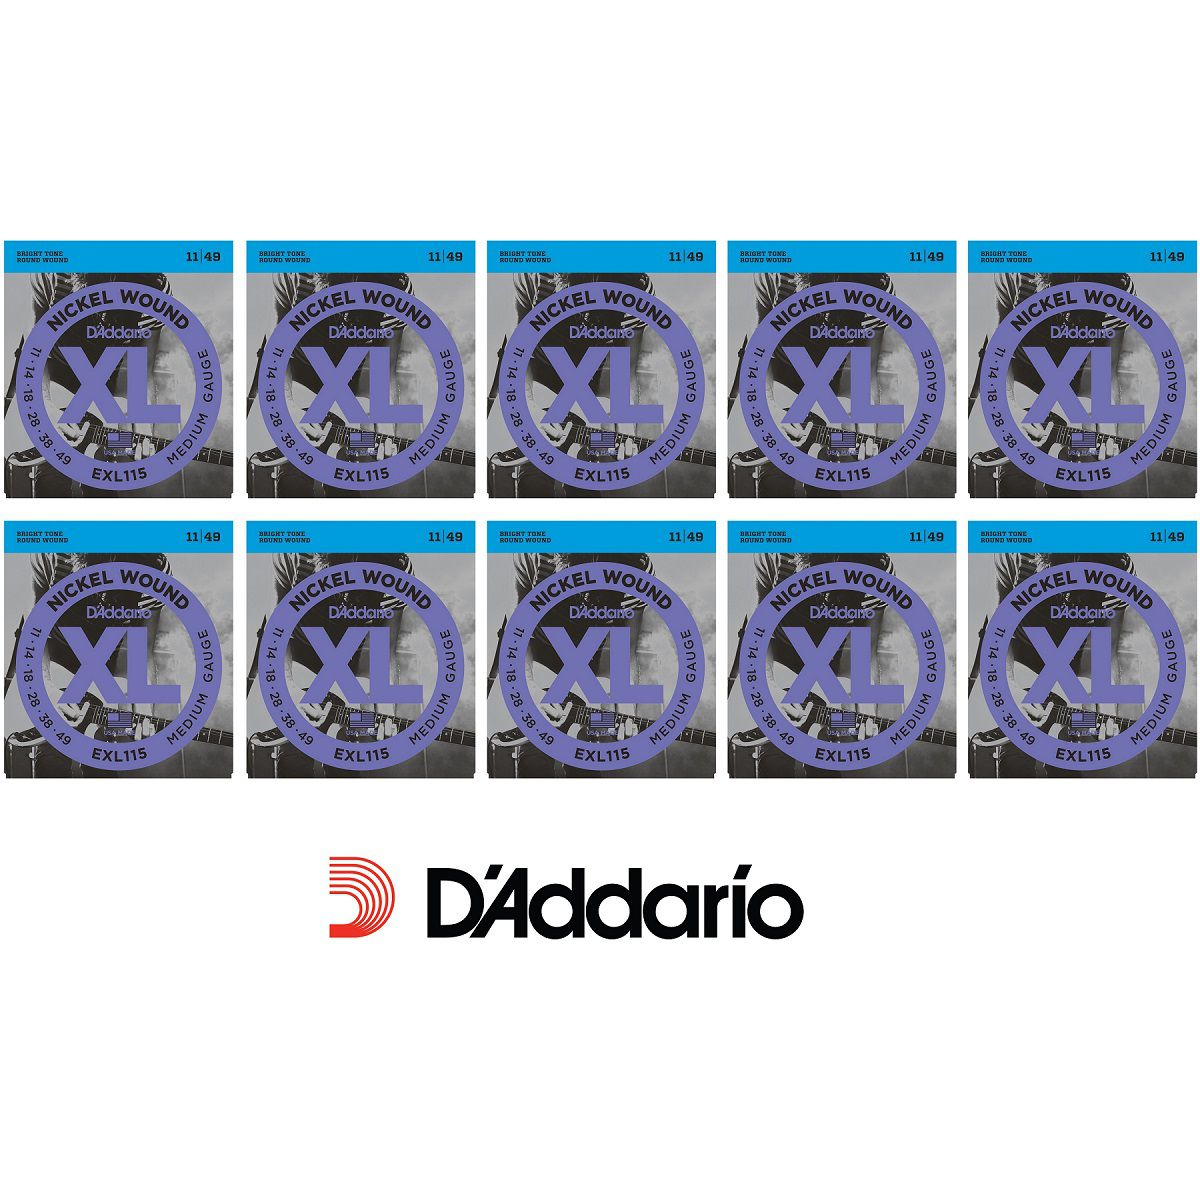 CAIXA 10 ENCORDOAMENTOS DADDARIO GUITARRA EXL115B 0.11 ORIGINAL MADE IN USA